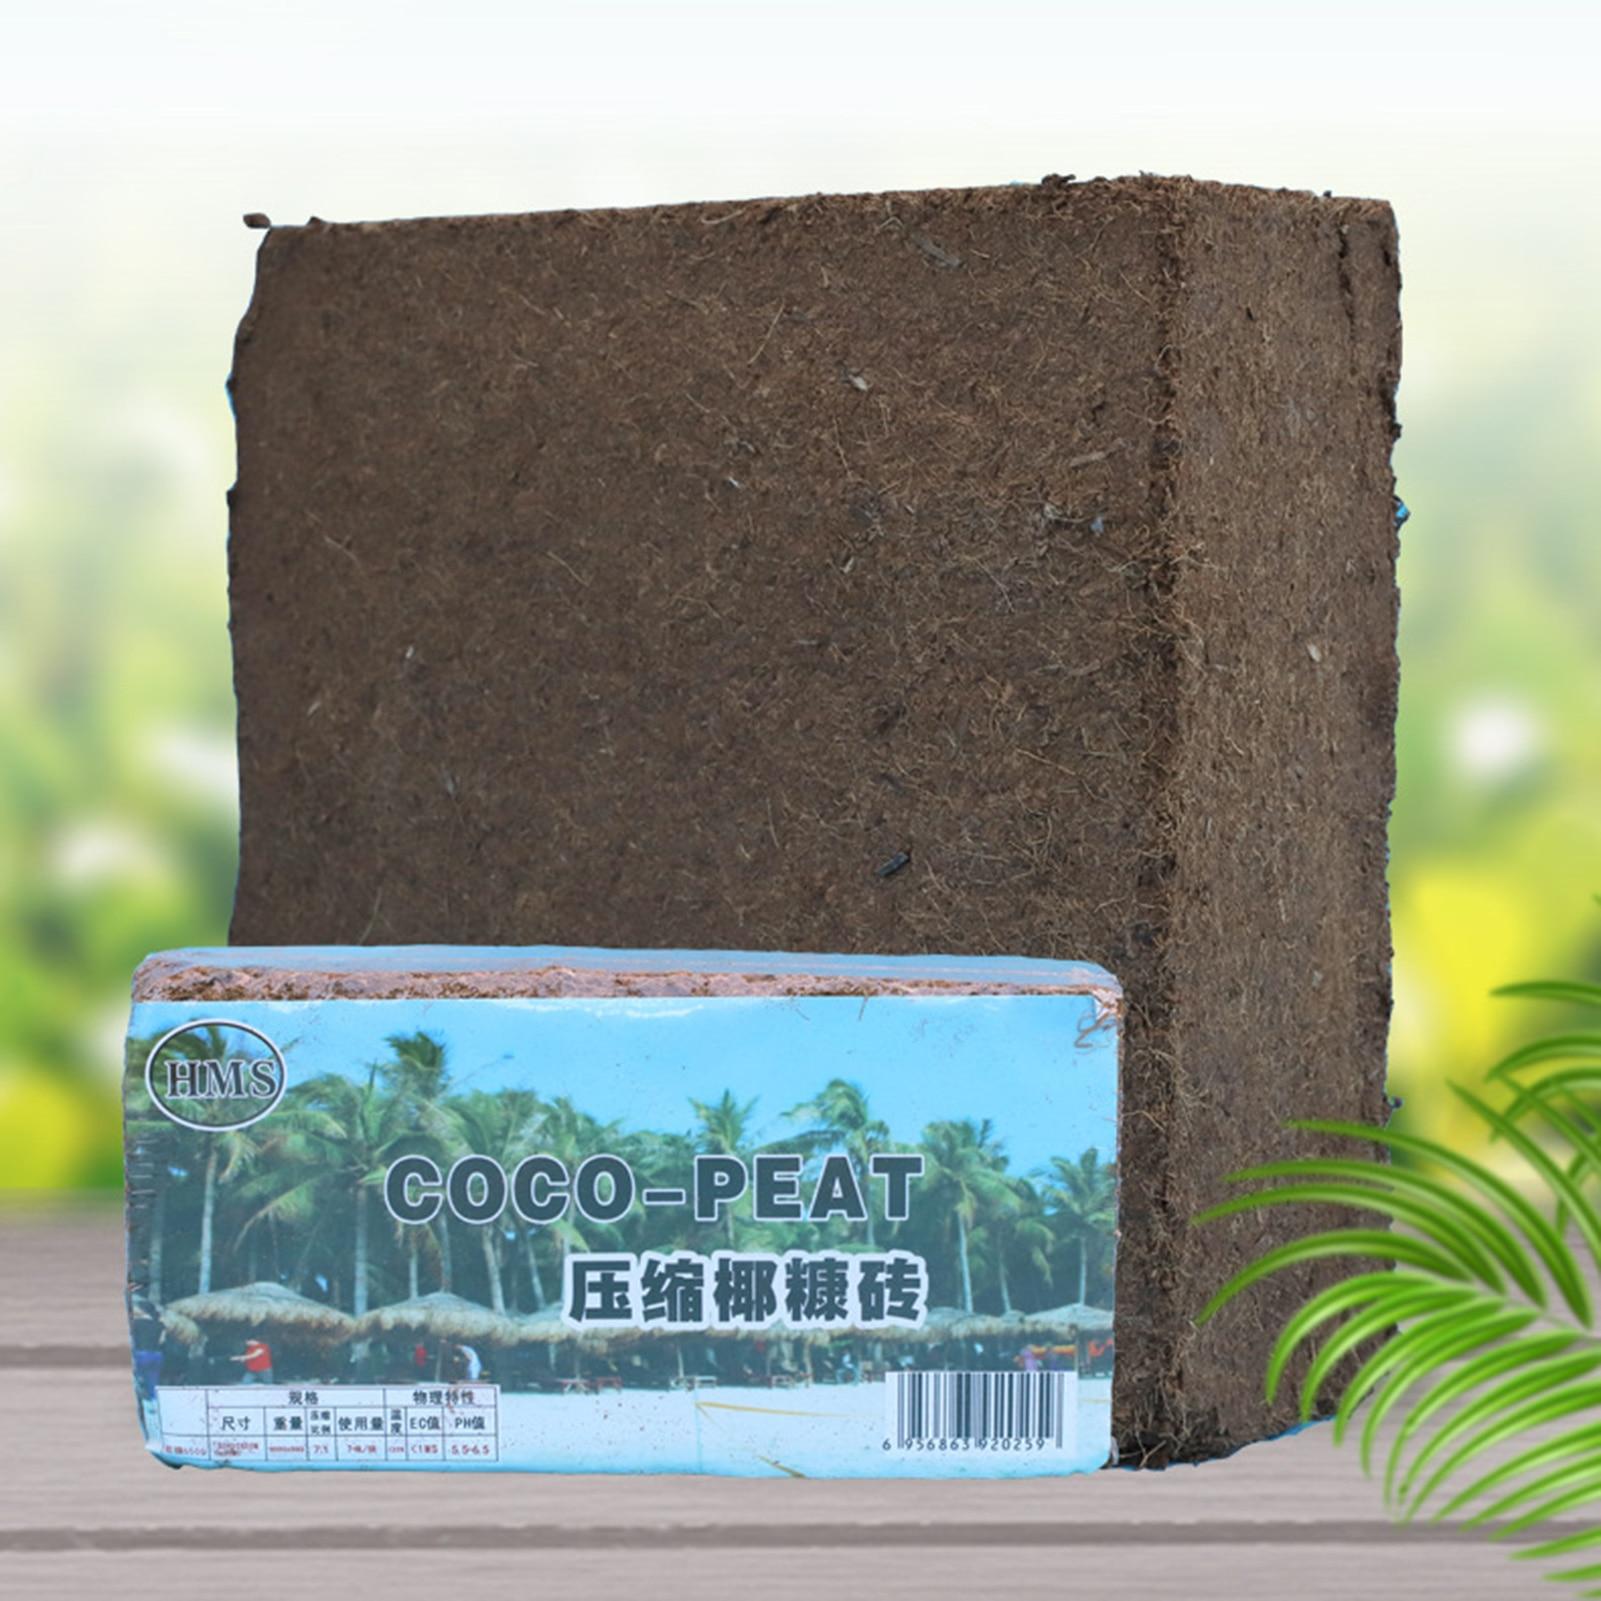 600g Coconut Coir Brick Peat Growing Organic Soilless Potting Garden Natural Plants Soil Nutrient Bed